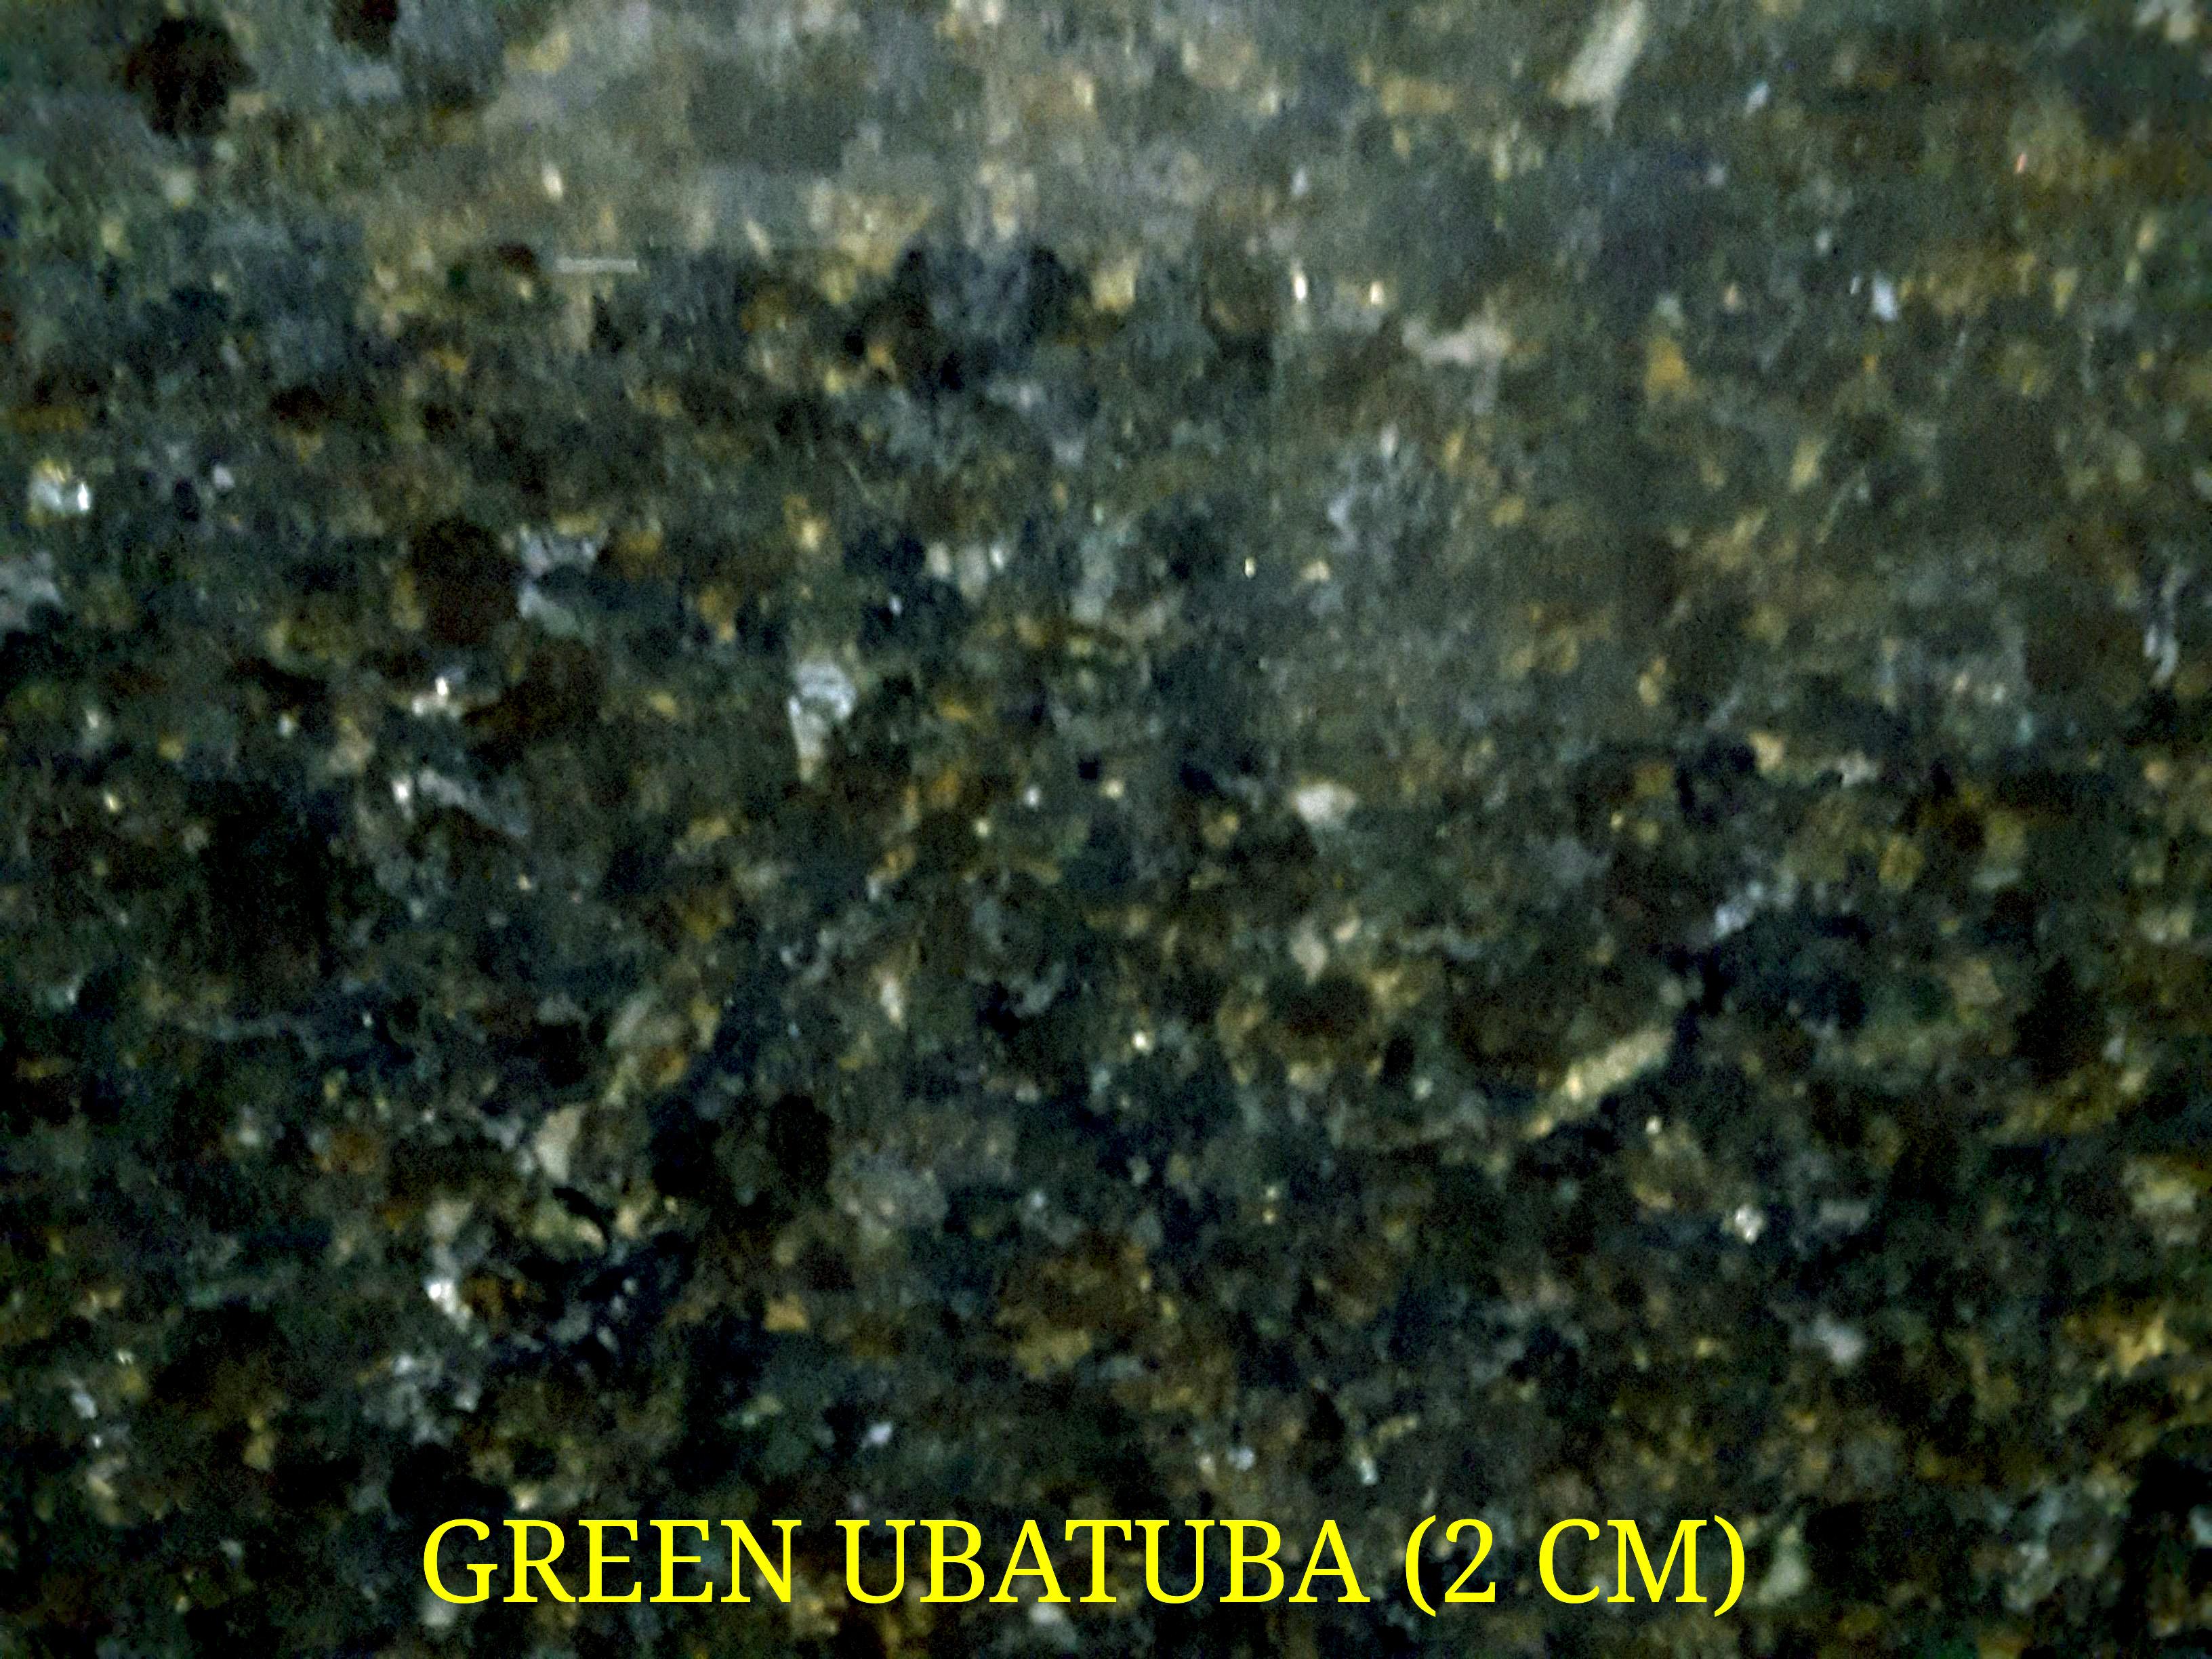 GREEN UBATUBA (2 CM)-2